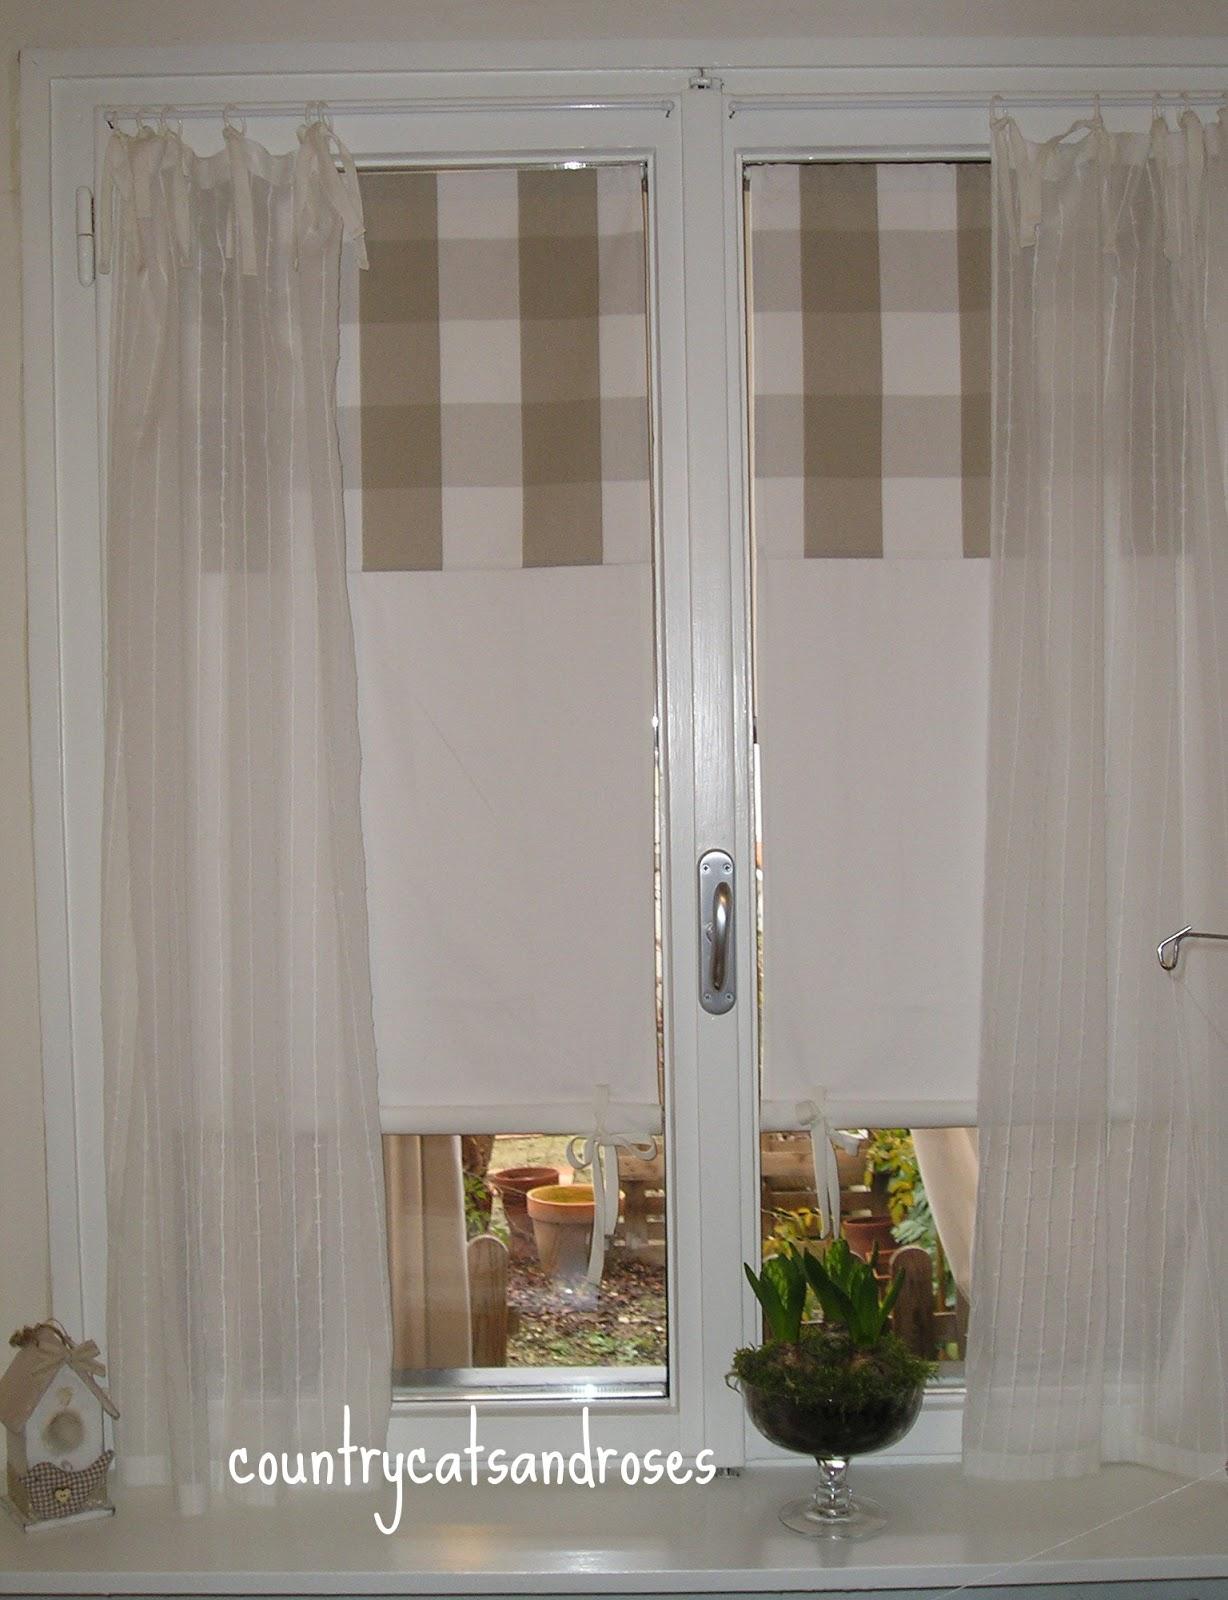 Countrycatsandroses gennaio bianco ordine e tende - Tende finestre ikea ...